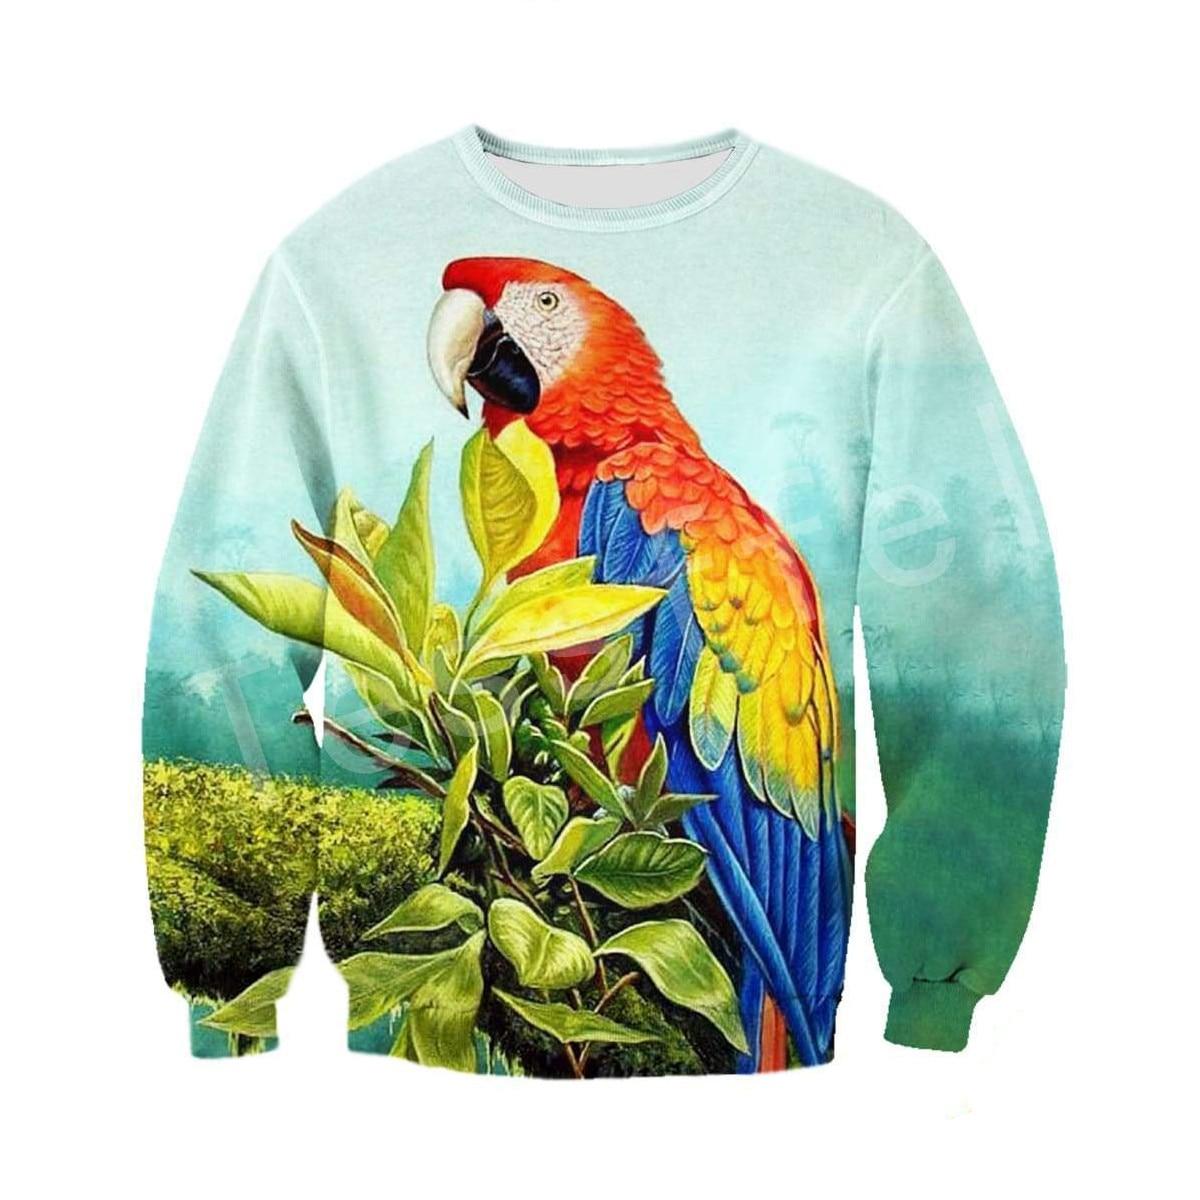 Tessffel Animal Parrot Tracksuit MenWomen HipHop 3Dfull Printed Sweatshirts Hoodie shirts Jacket Harajuku Casual colorful Style7 in Hoodies amp Sweatshirts from Men 39 s Clothing